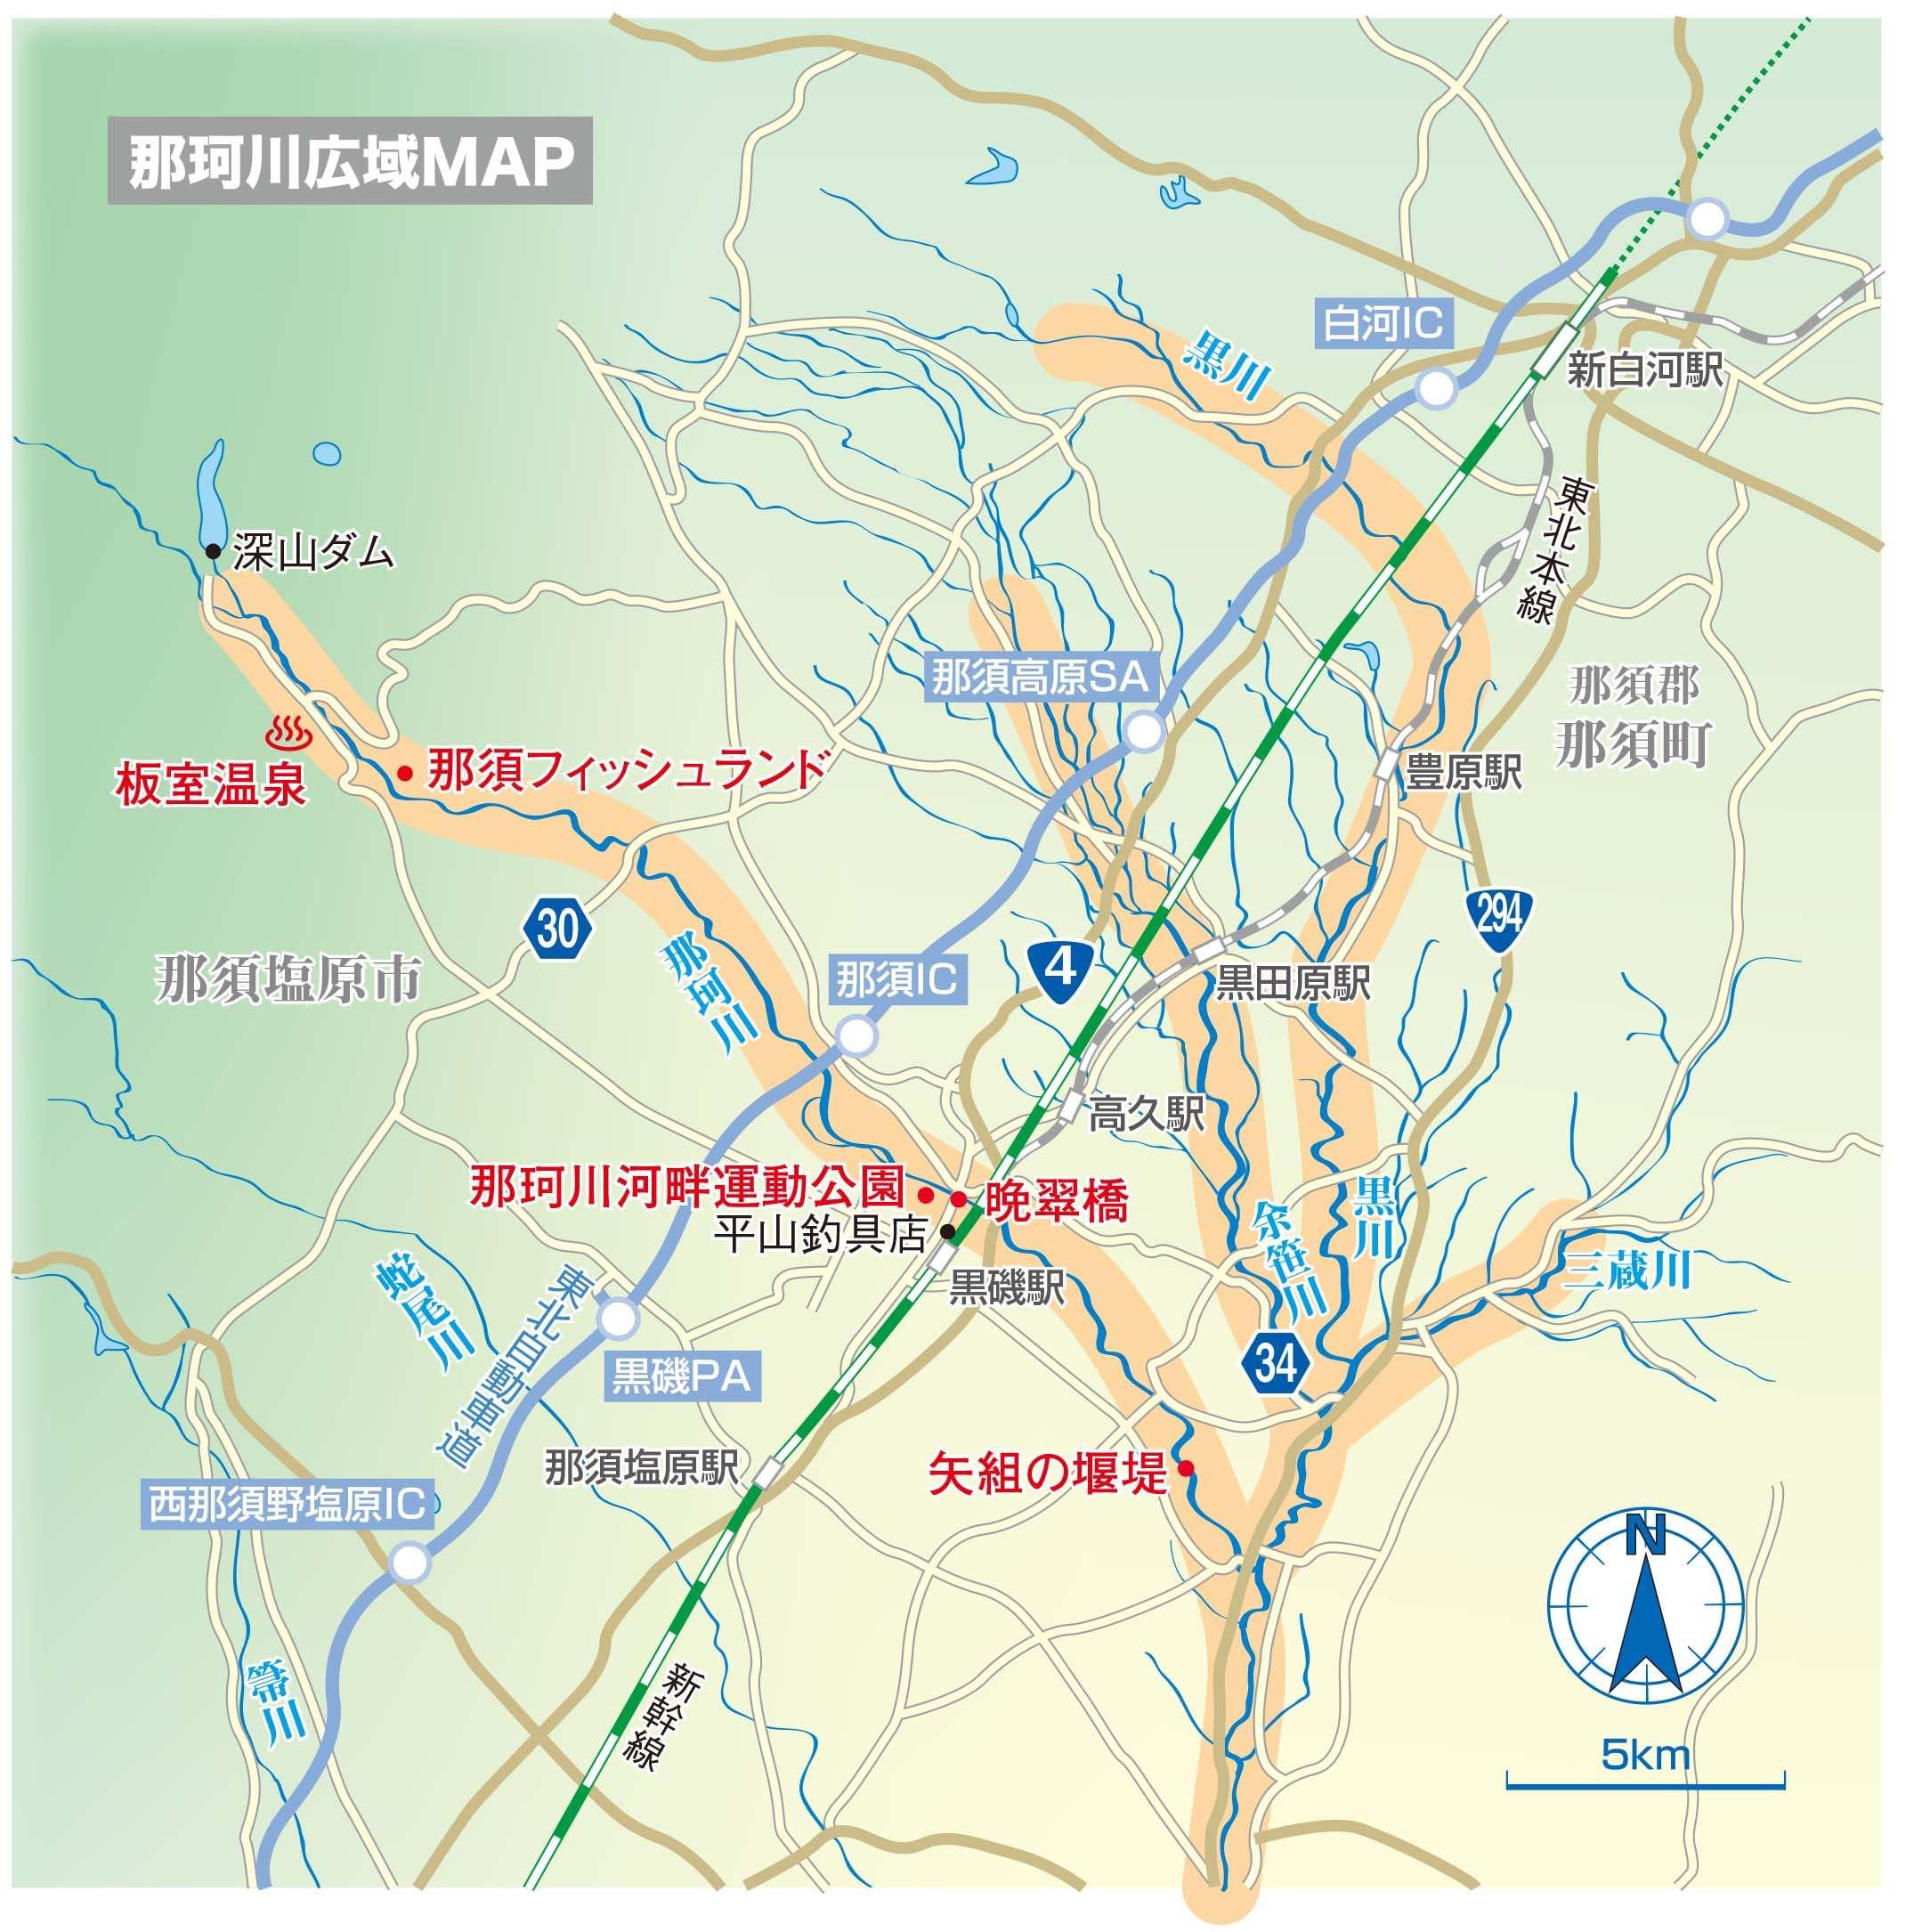 028-036dantou-keiryu_cs6 (11)